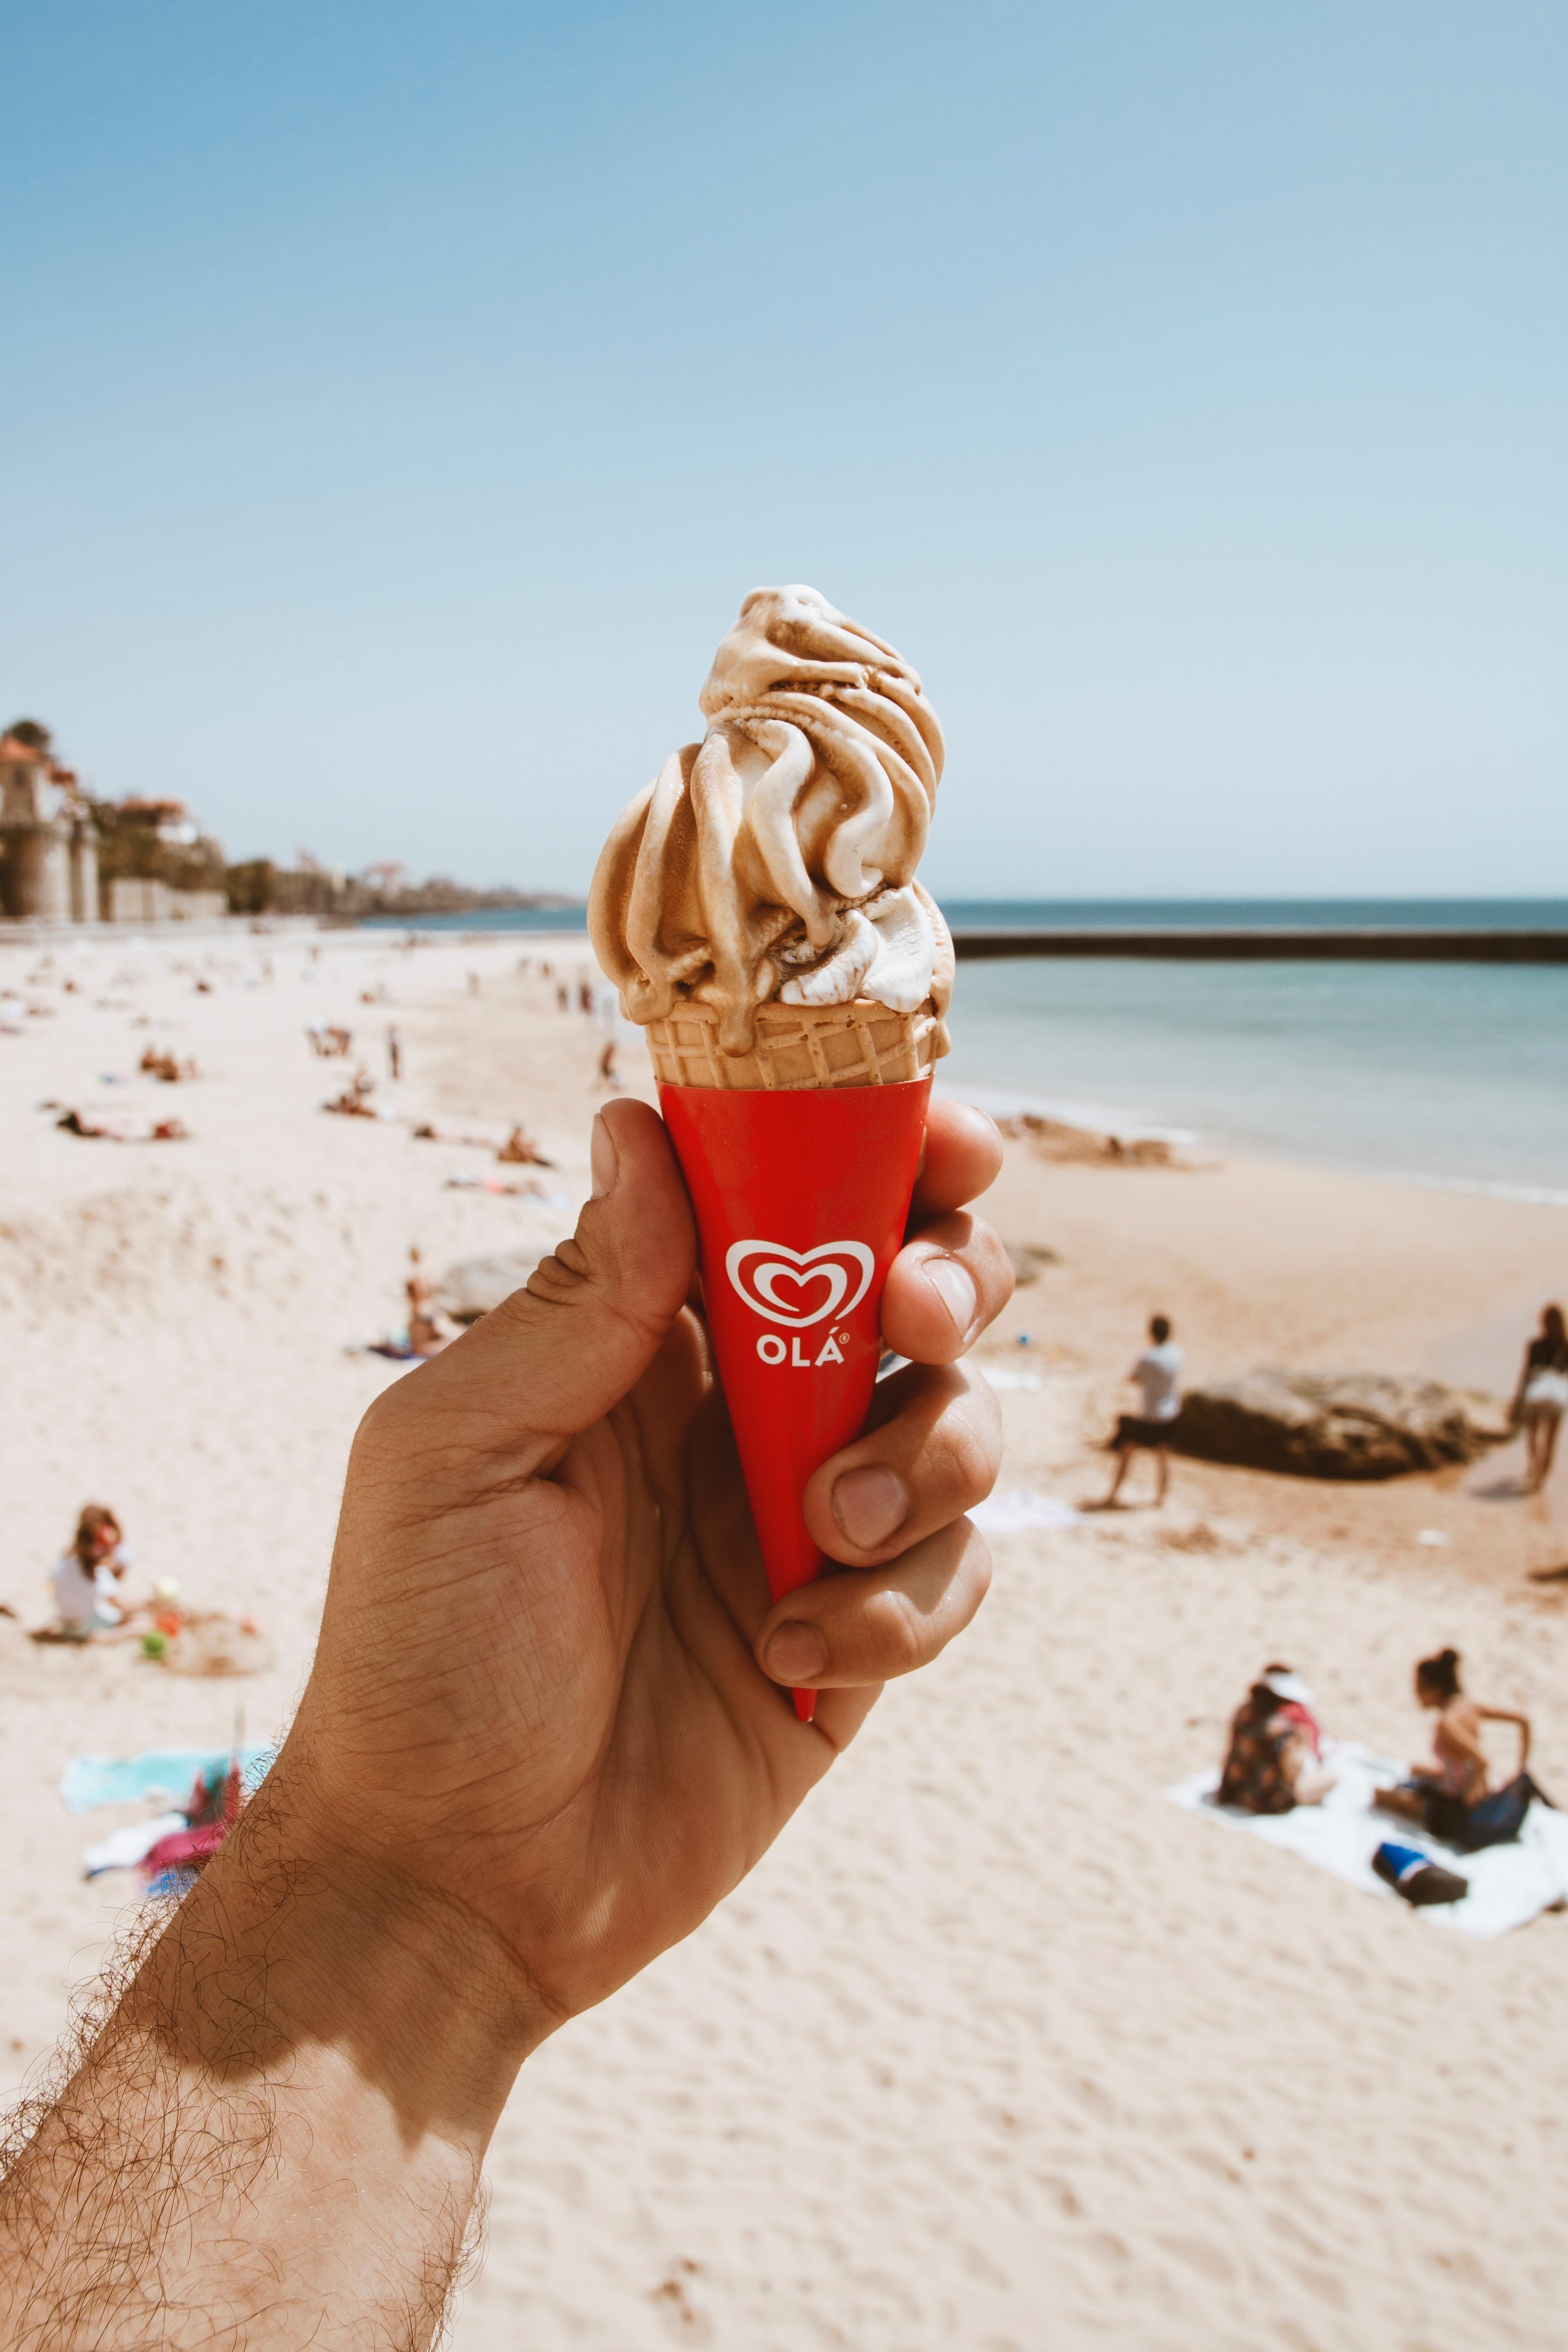 gelato on the beach